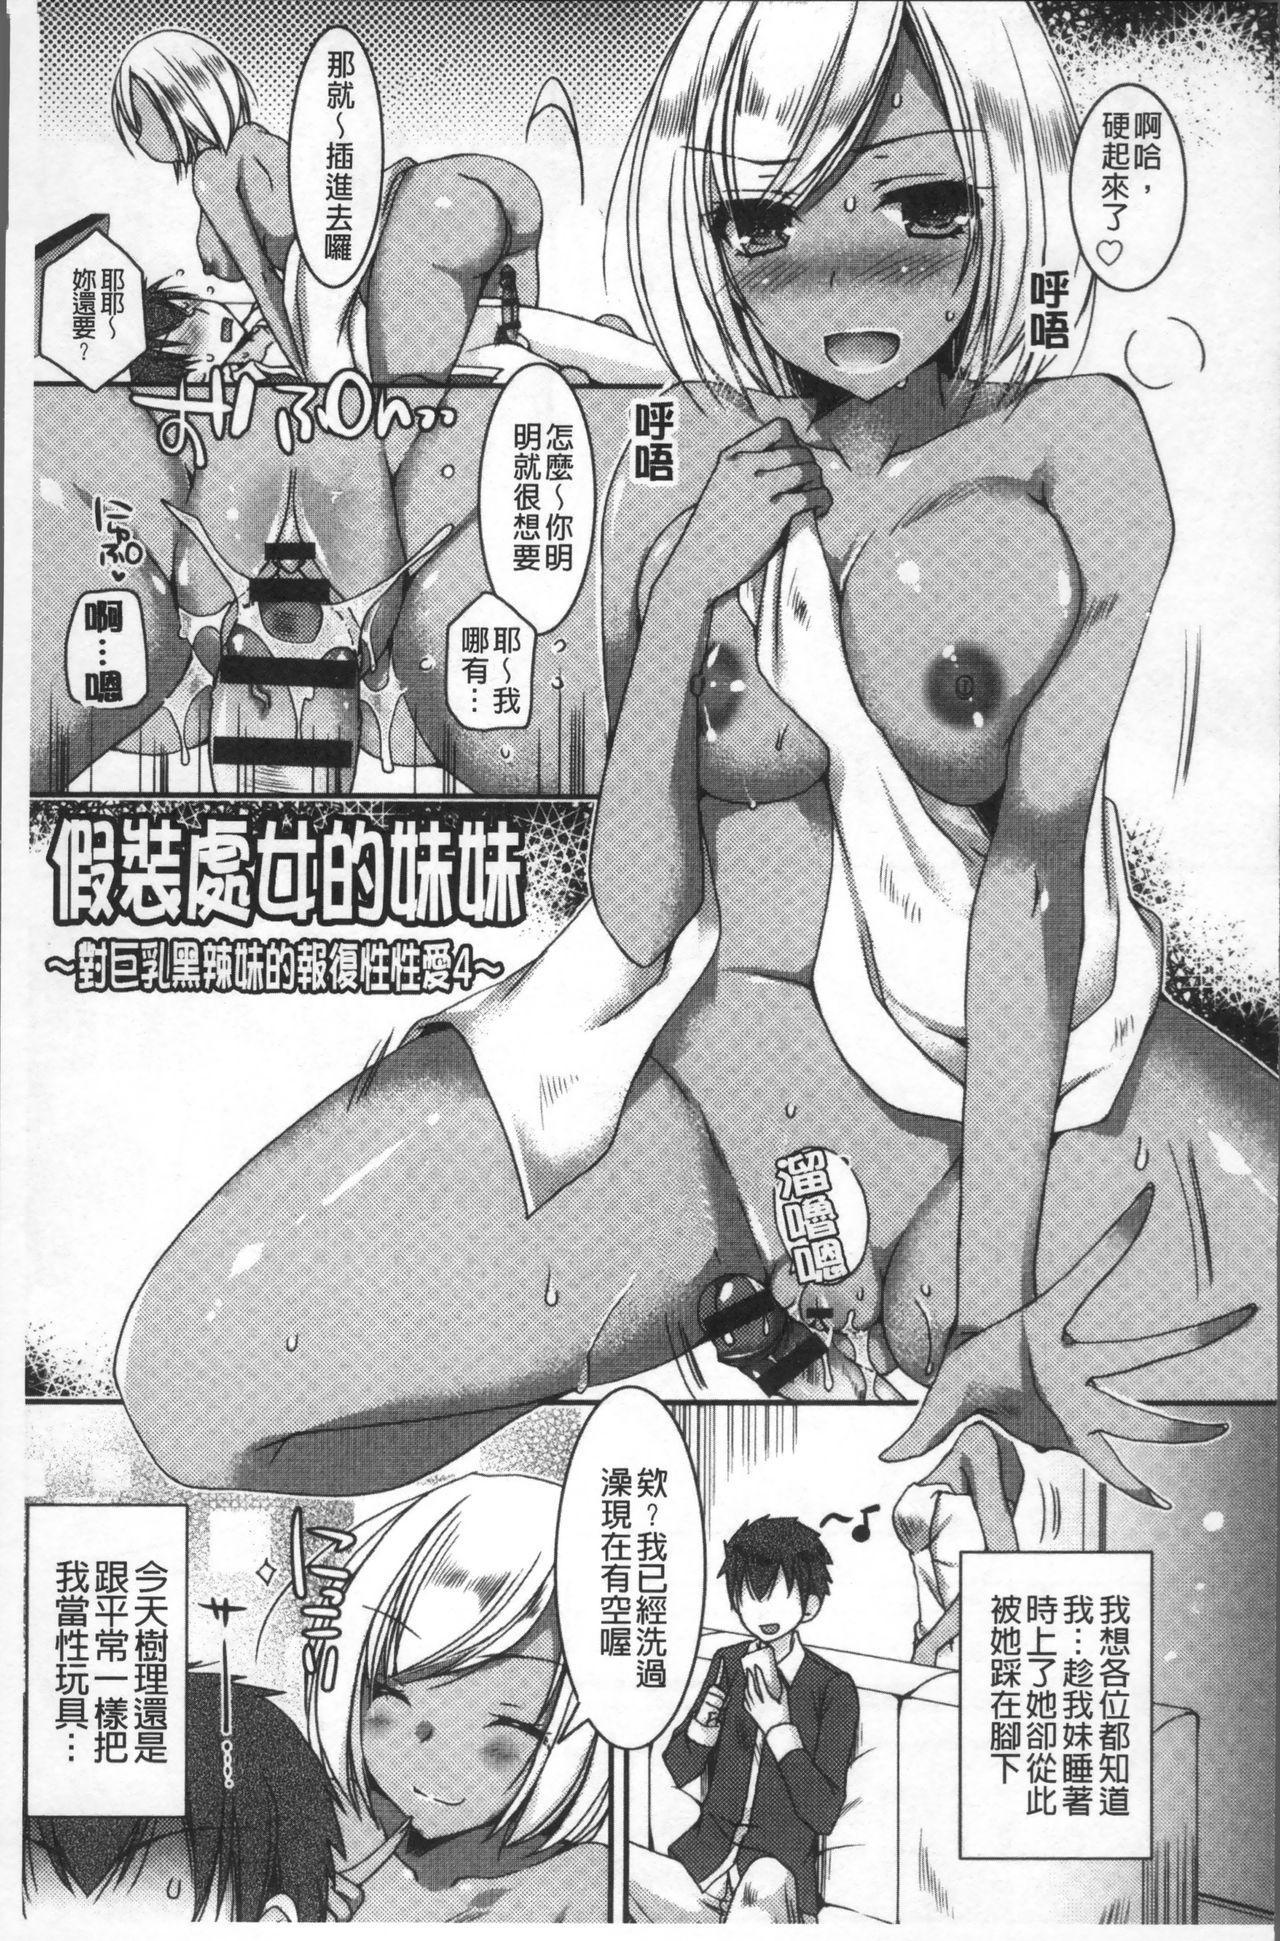 [Ueda Rieko] Doutei Killer na Imouto ~Bitch-kei Kyonyuu Gal ni Yarare Houdai~ | 童貞殺手的妹妹~被淫女系巨乳小辣妹給玩弄個過癮~ [Chinese] 74